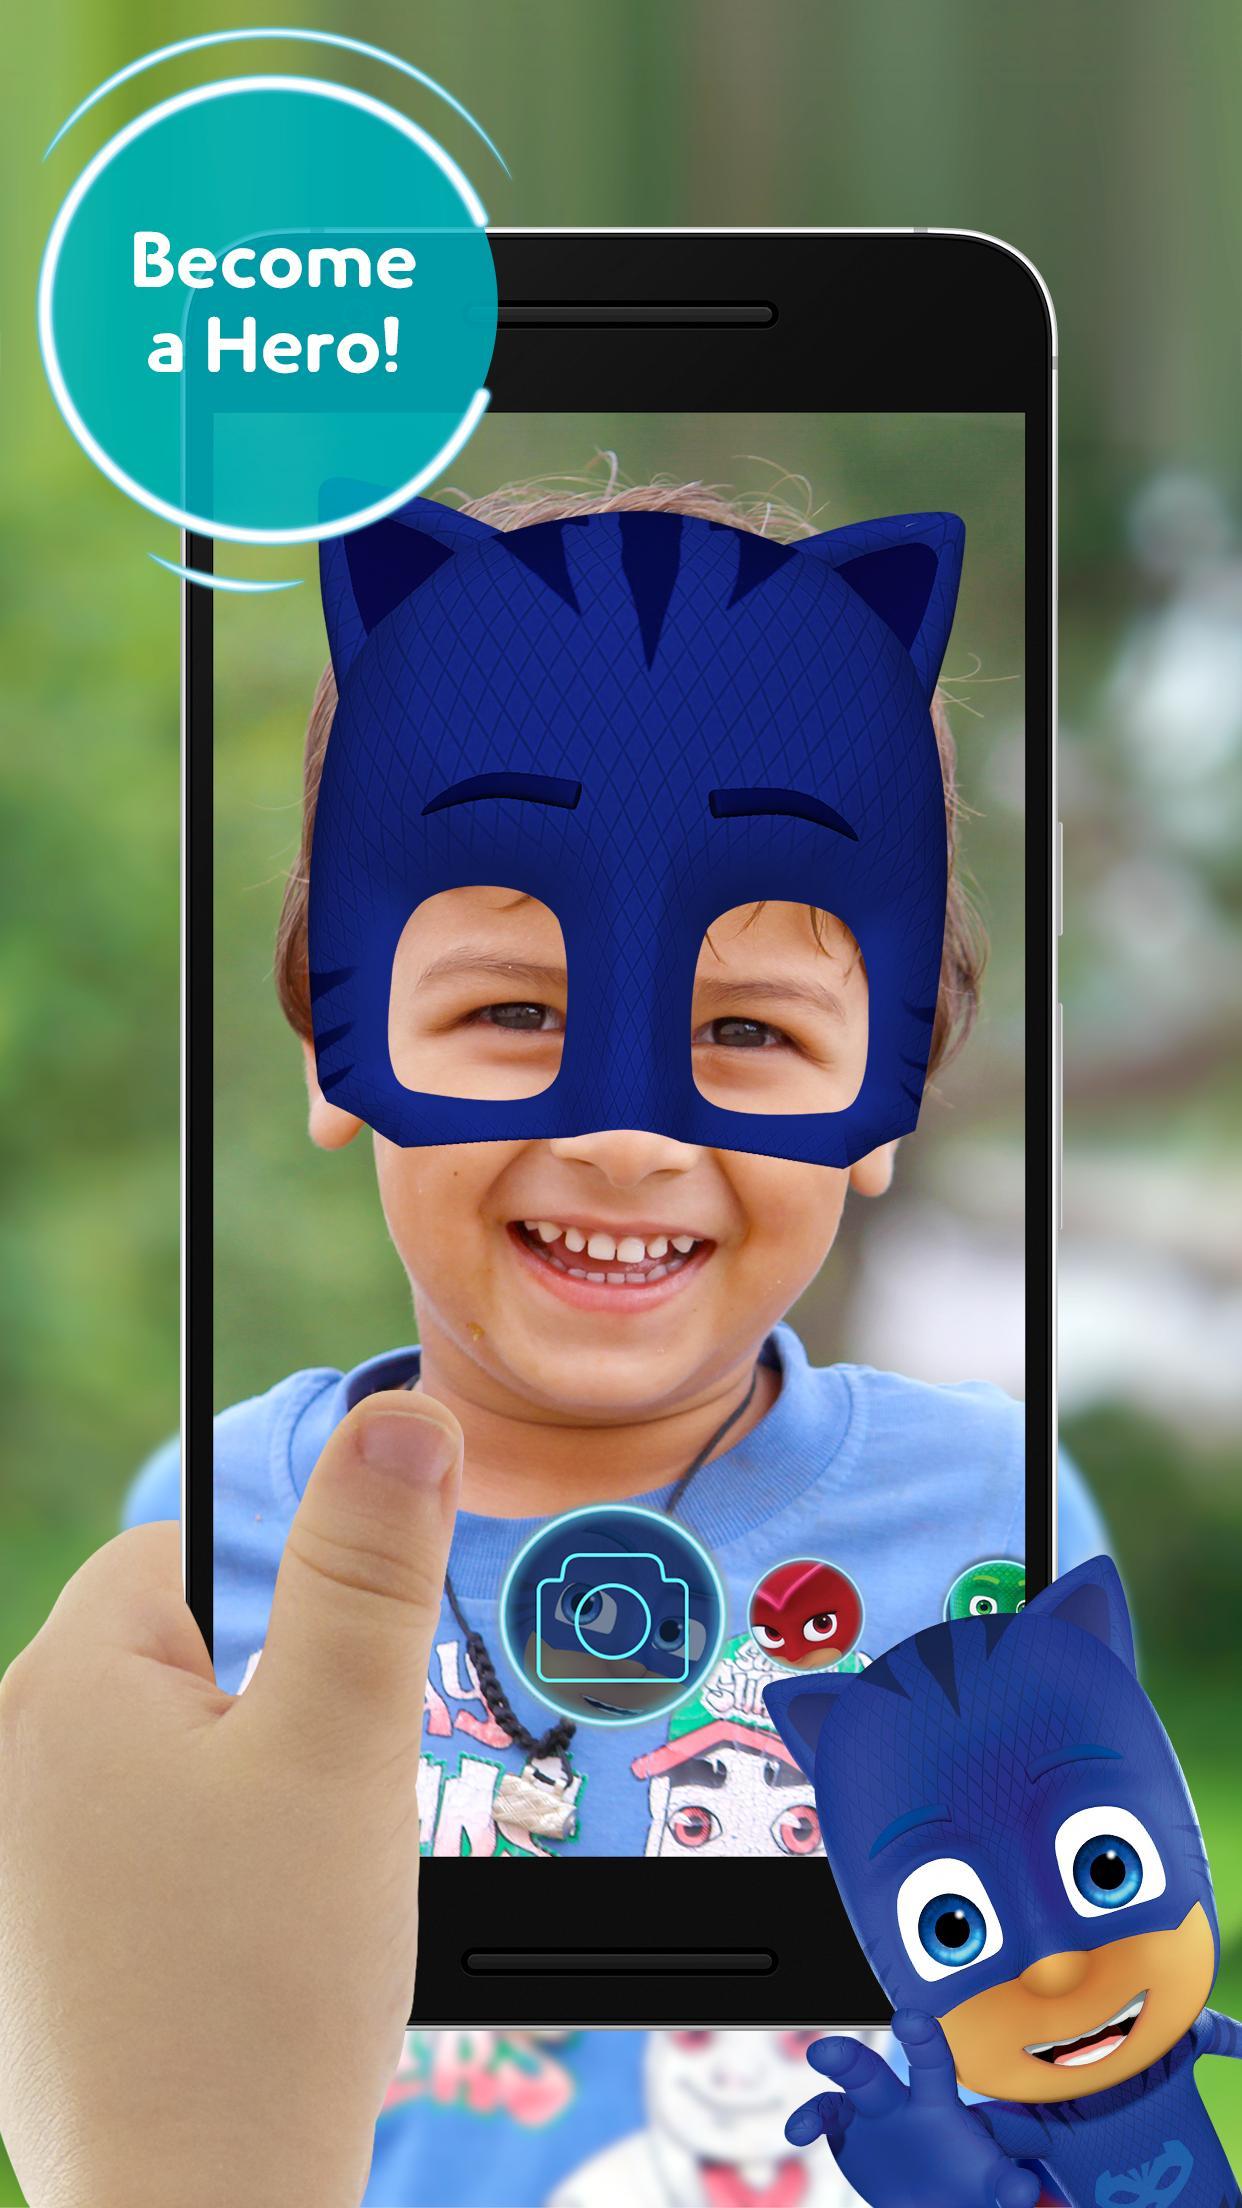 PJ Masks Time To Be A Hero 2.1.2 Screenshot 2